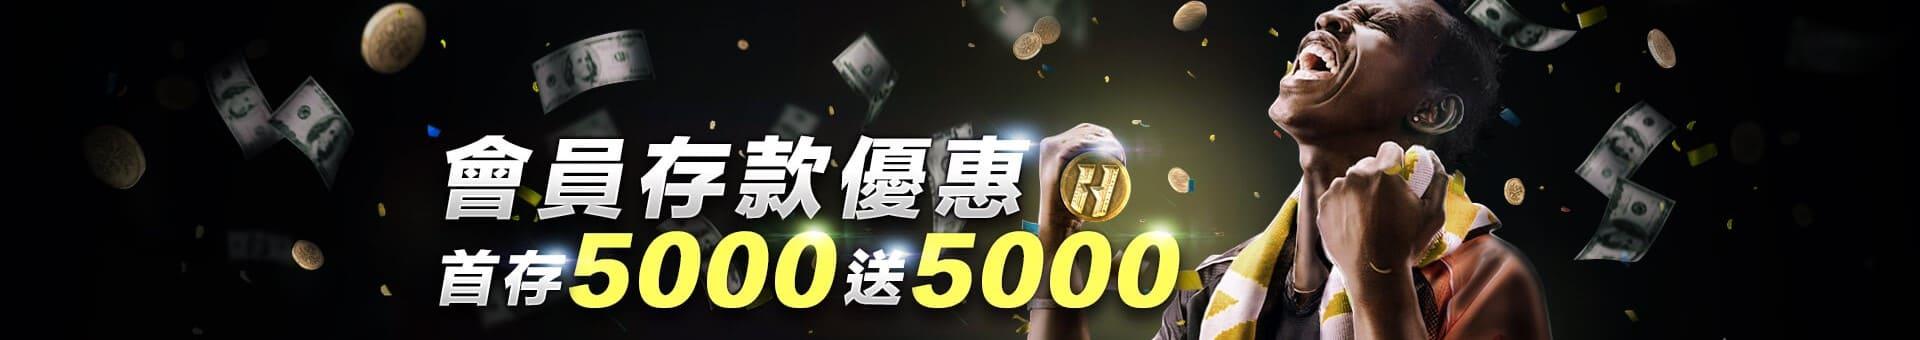 HOYA娛樂城首存5000送5000